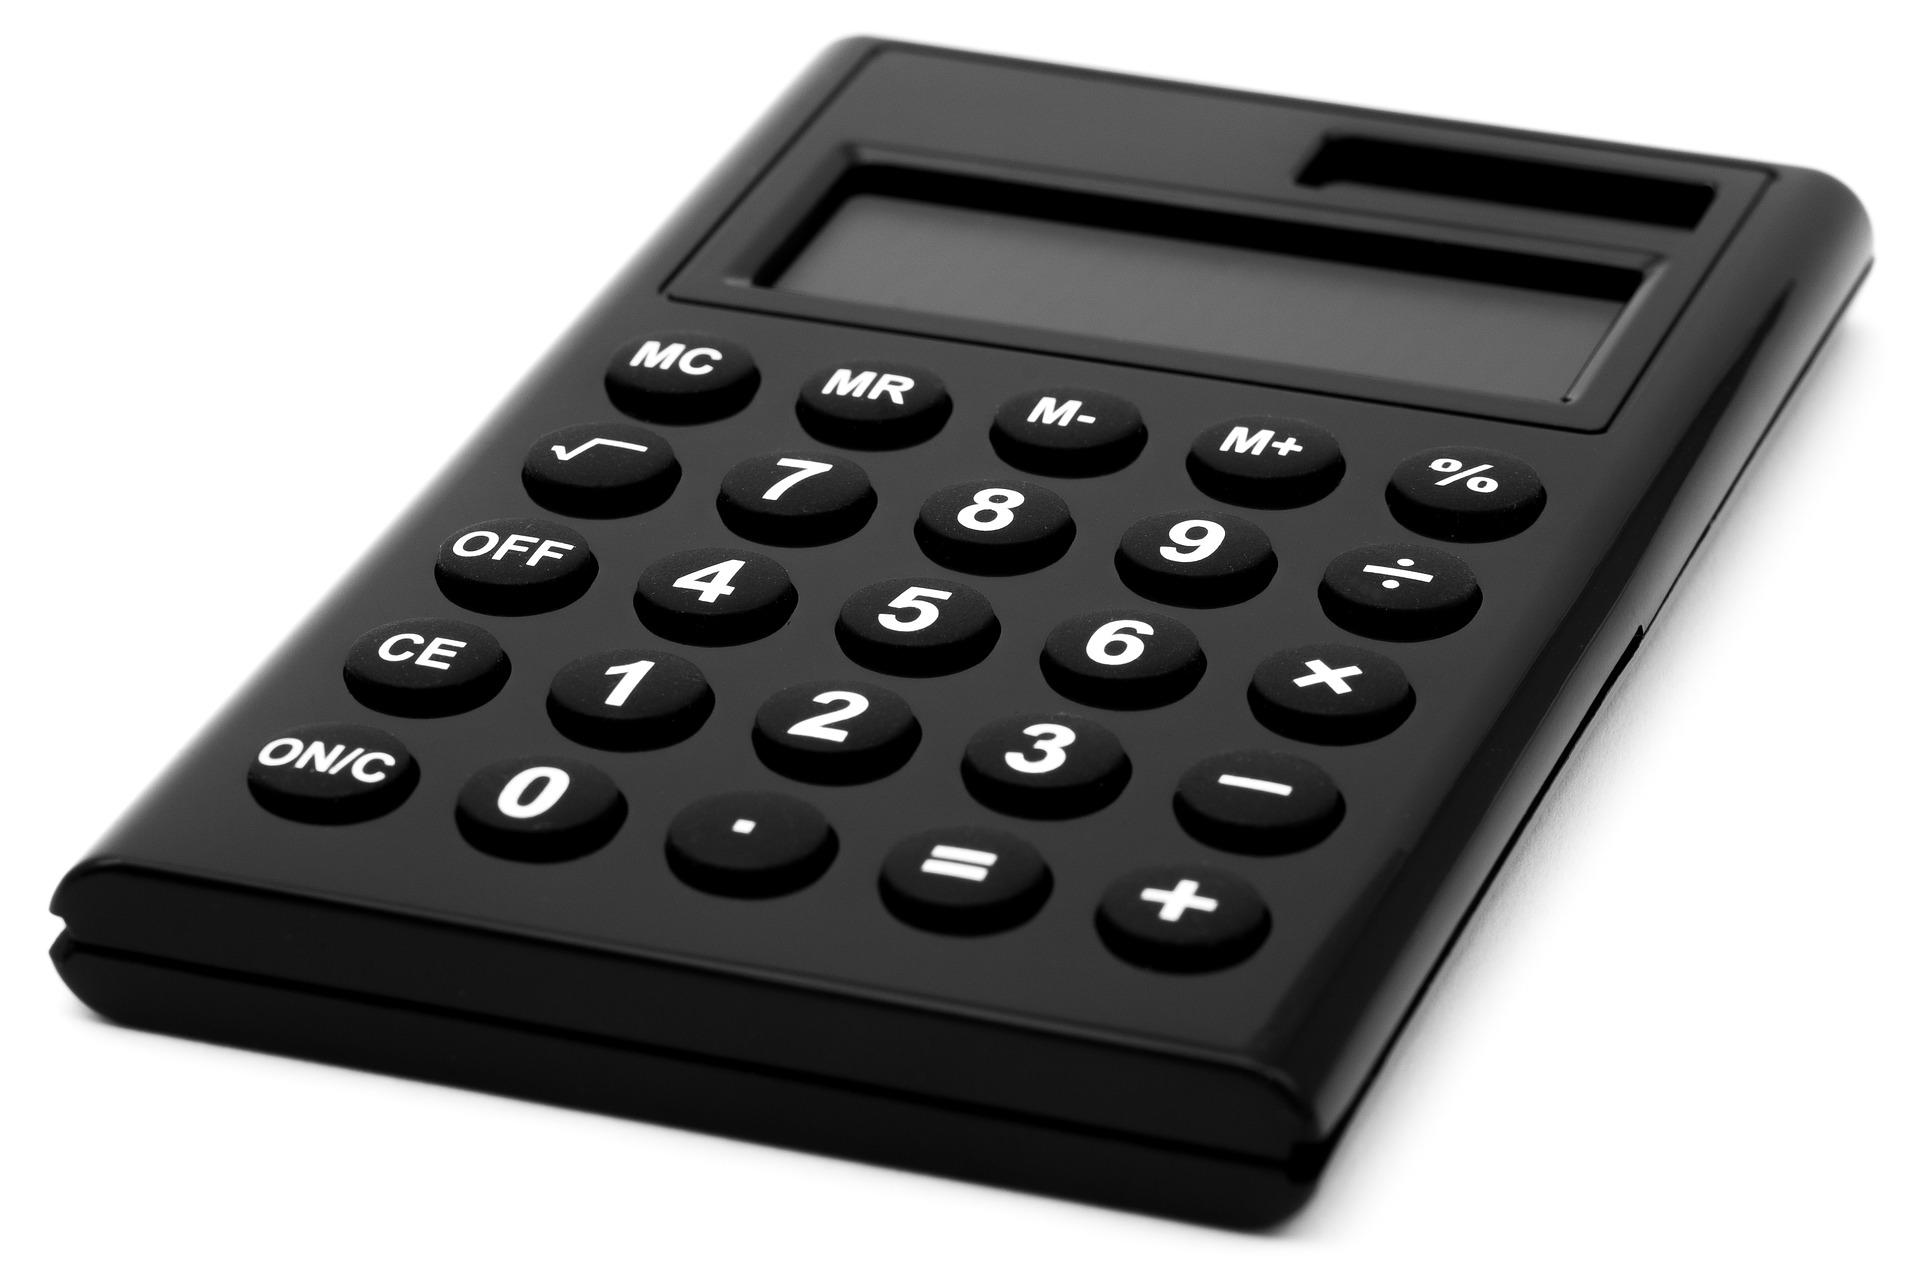 calculator-168360_1920.jpg